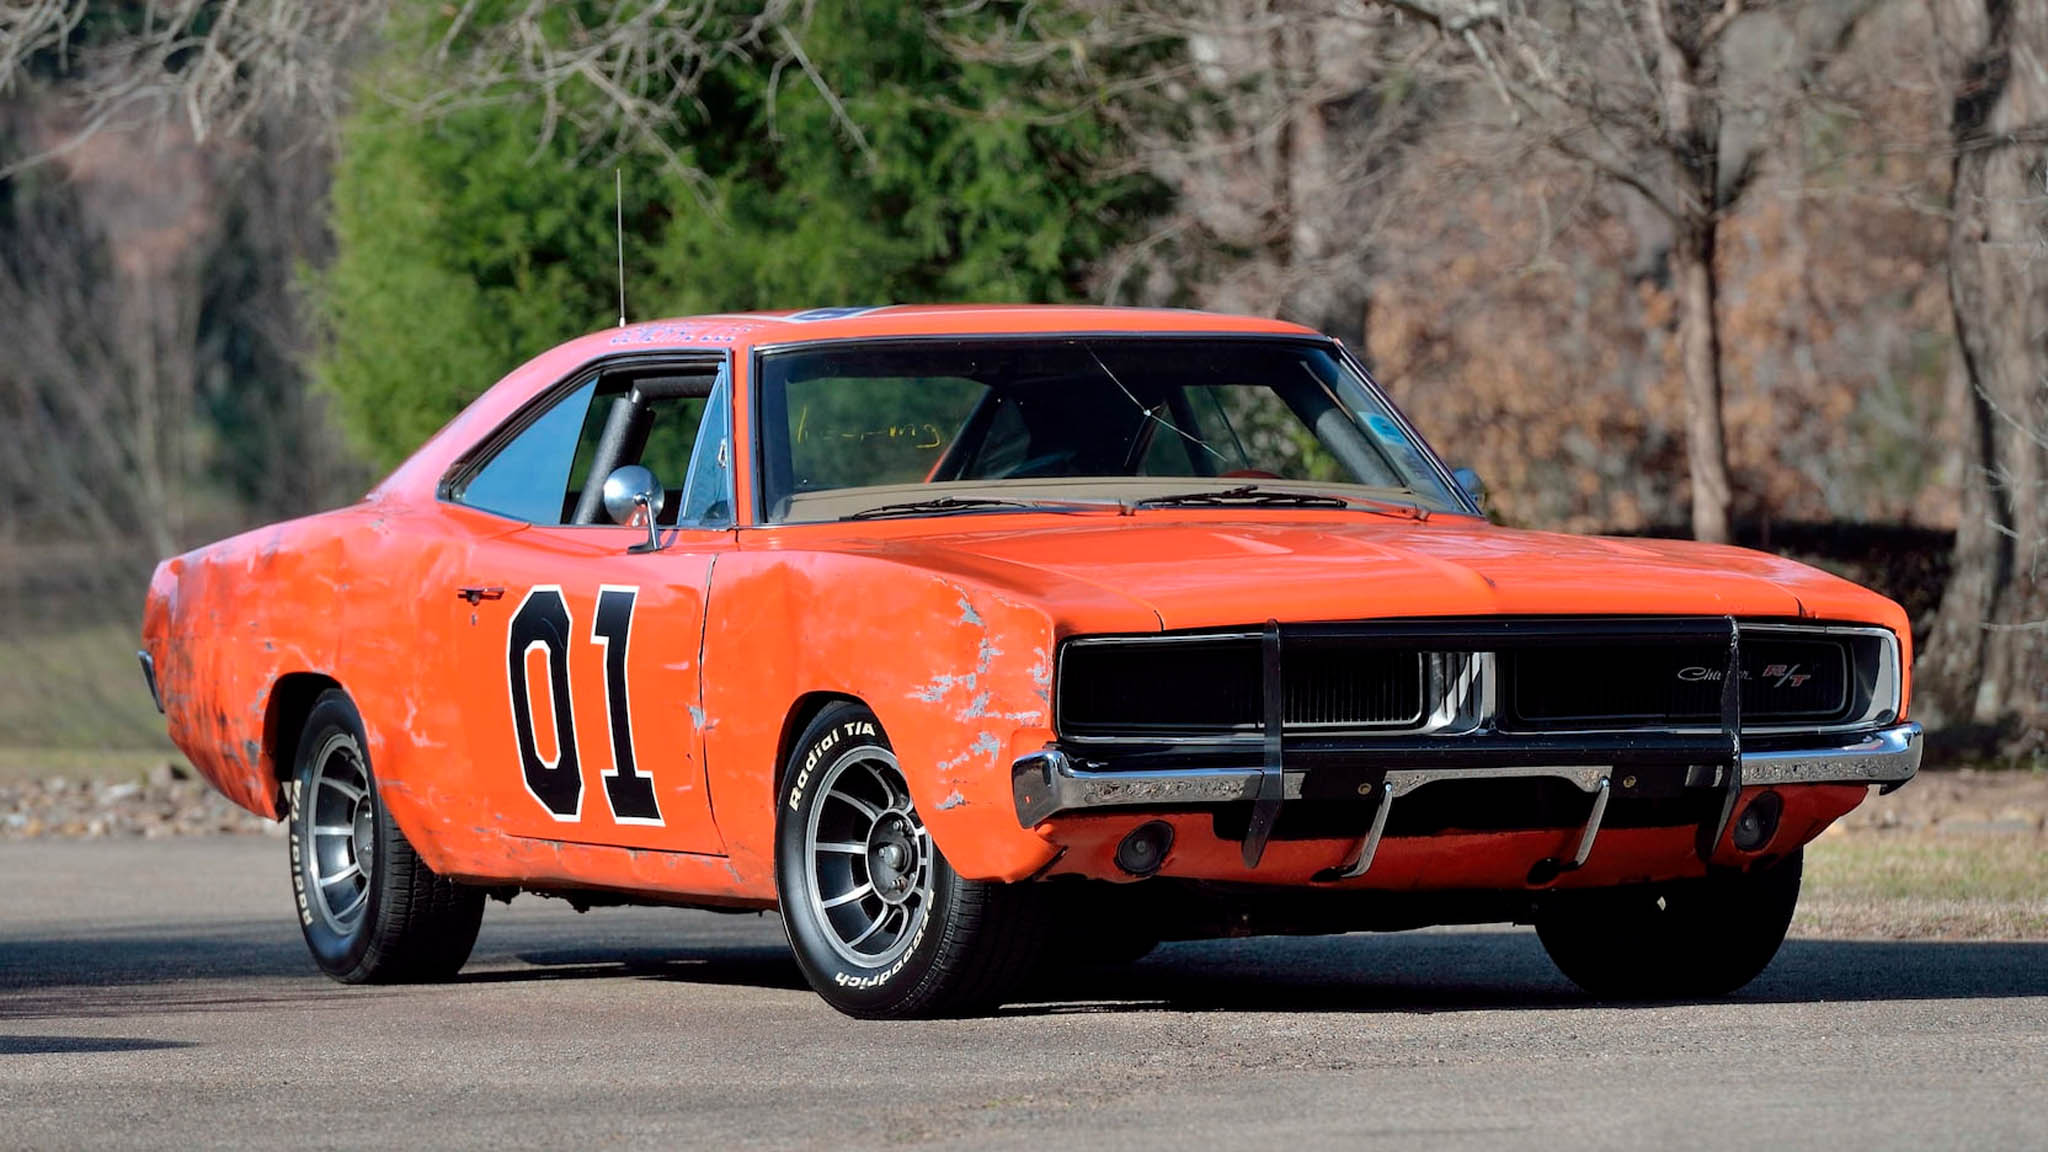 Dodge Charger General Lee 1969 Sprzedany Gielda Klasykow